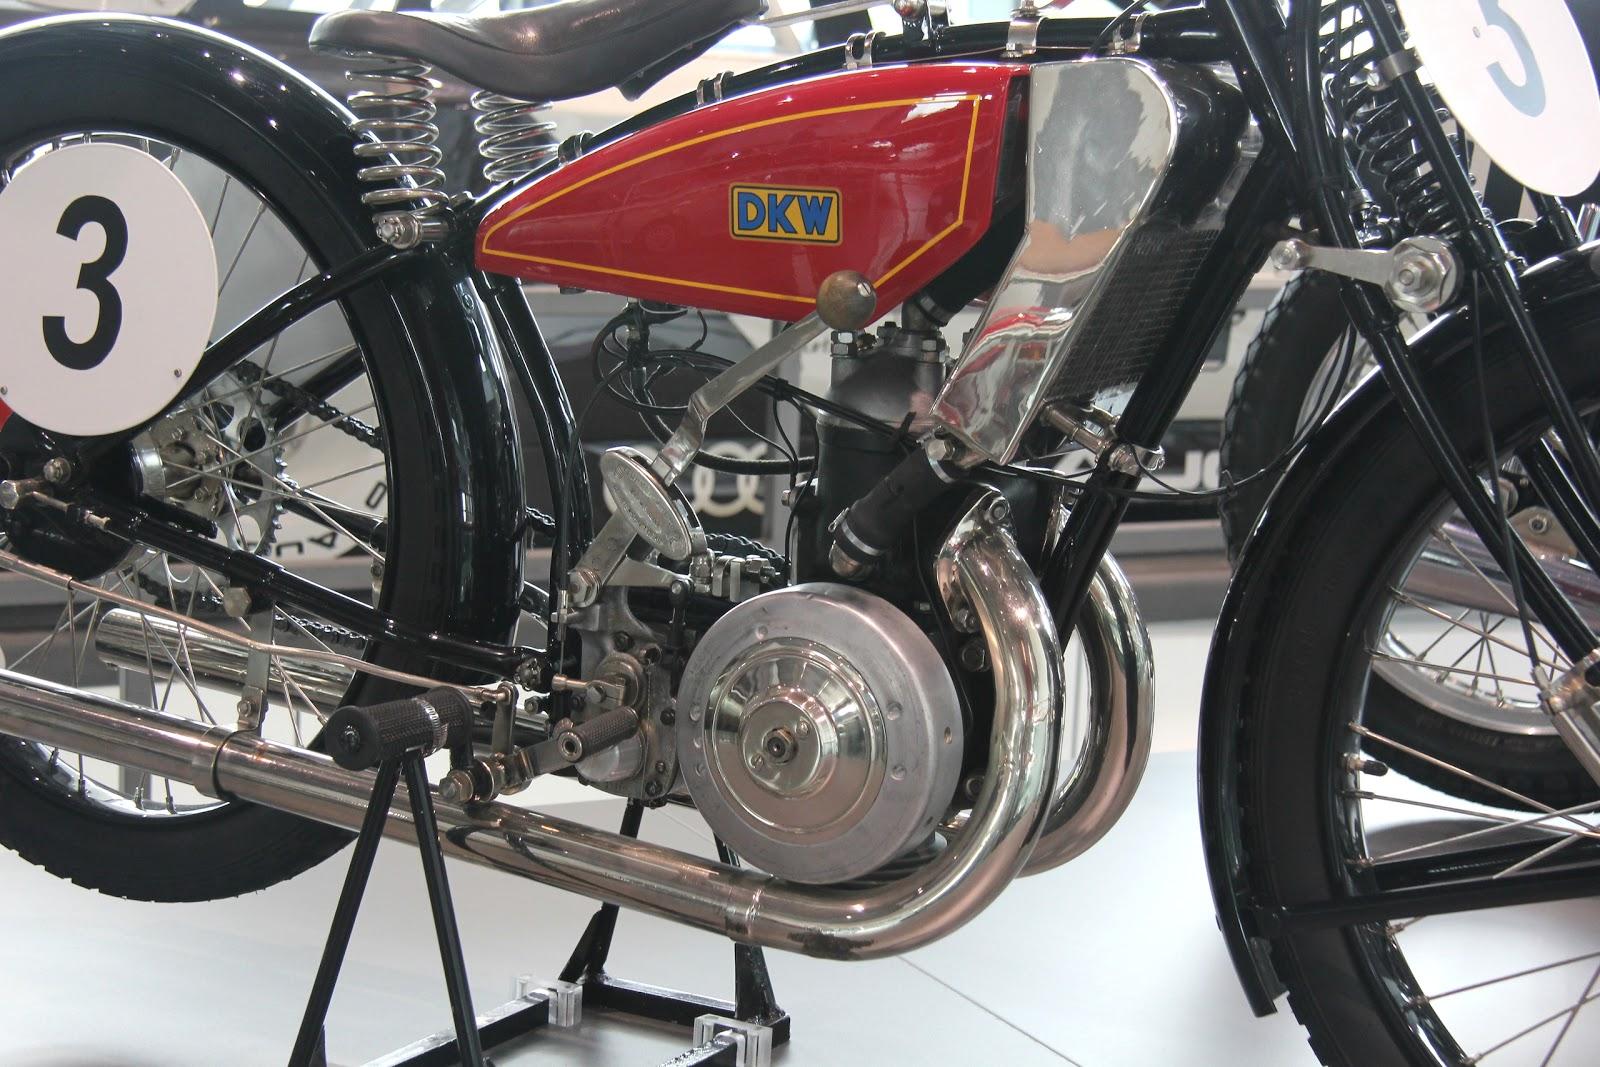 DKW ORe 250 Motorbike